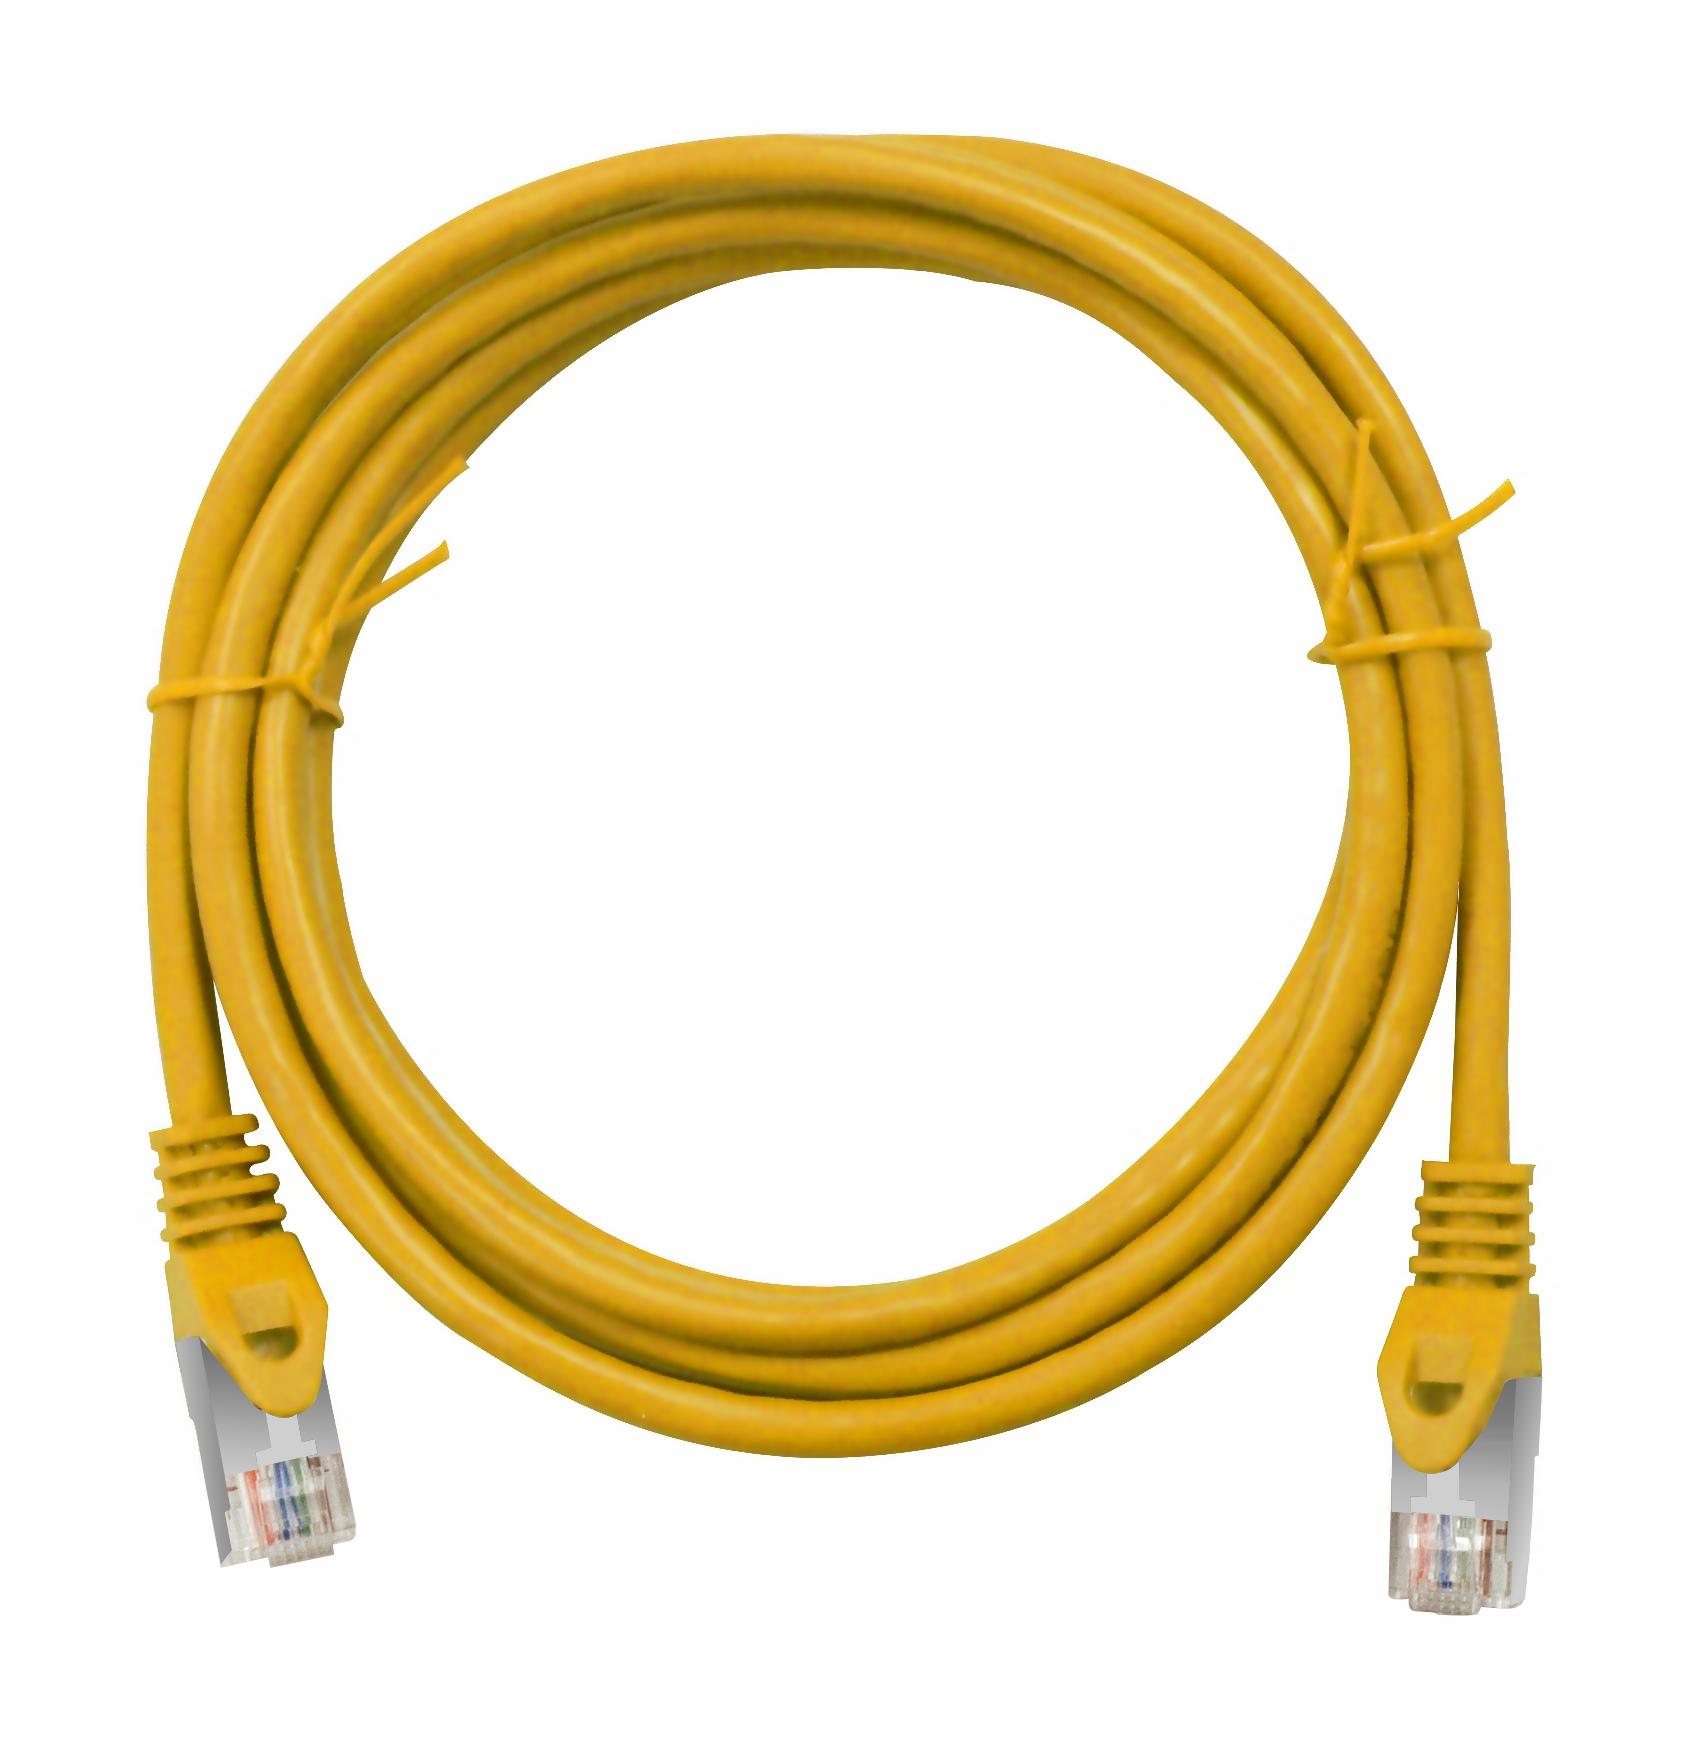 1 Stk Patchkabel RJ45 geschirmt Cat.6, PVC, gelb, 2,0m H6GLY02K0Y